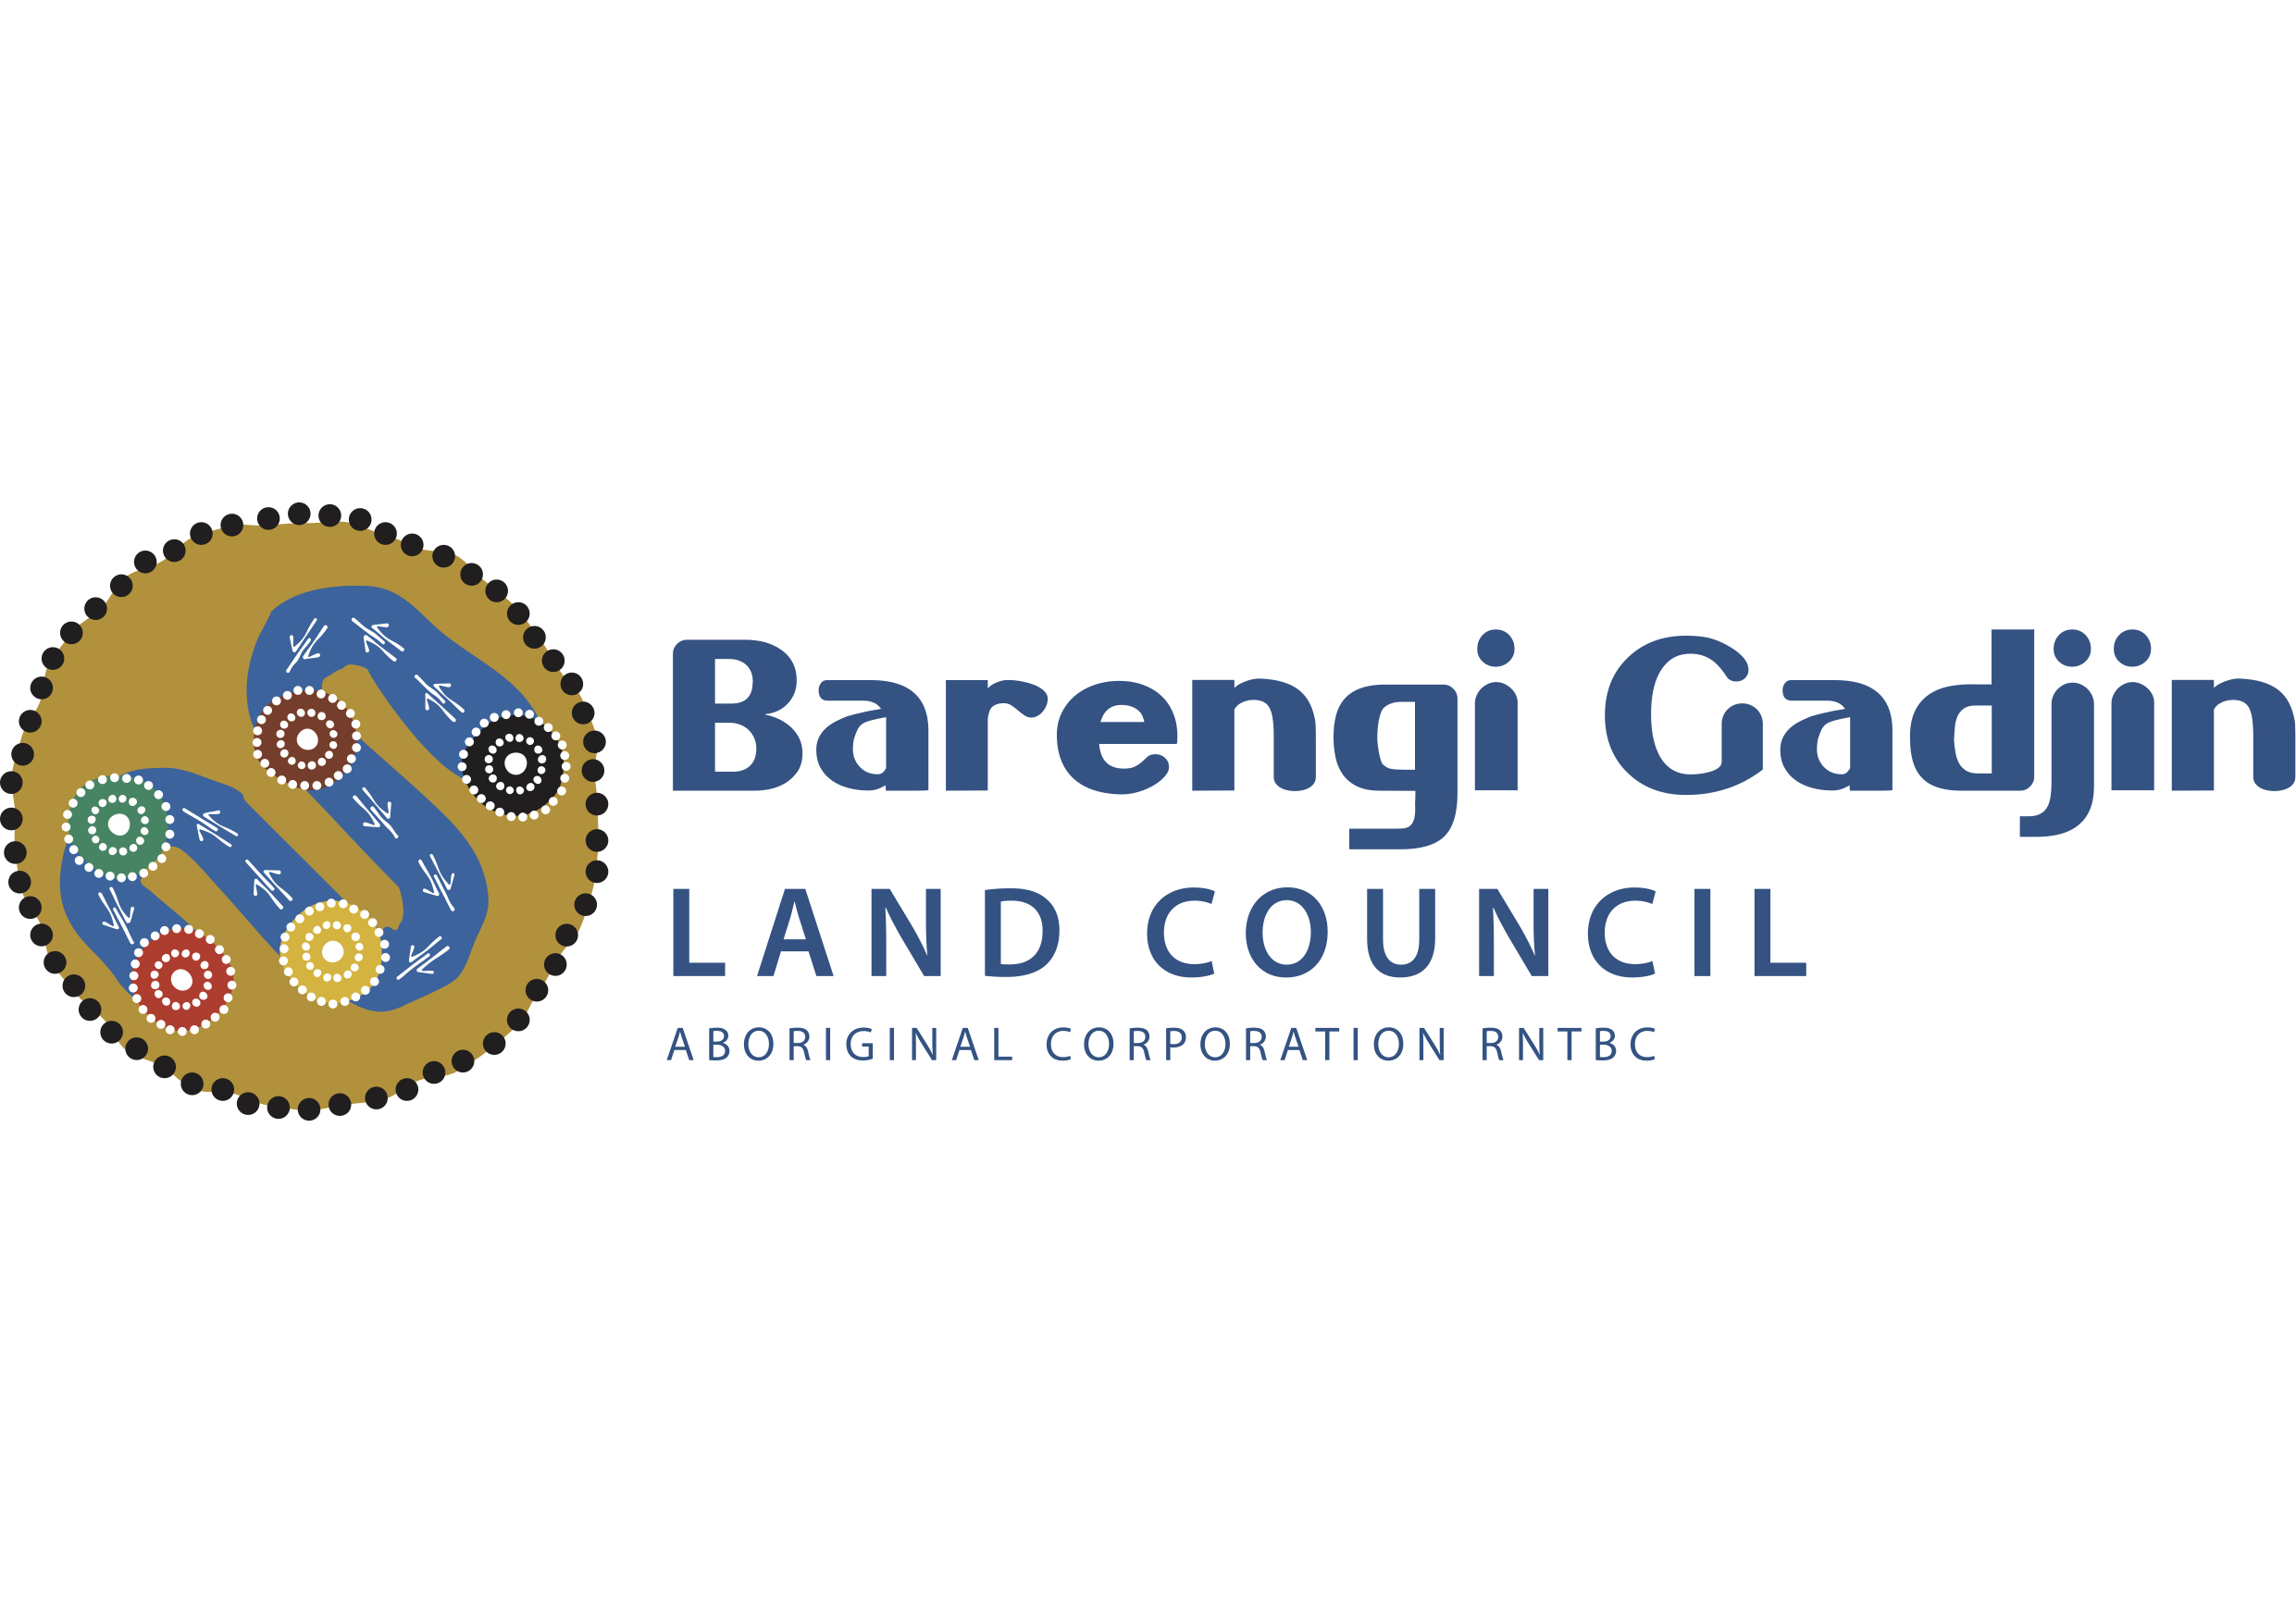 Barengi Gadjin Land Council - Logo.jpg